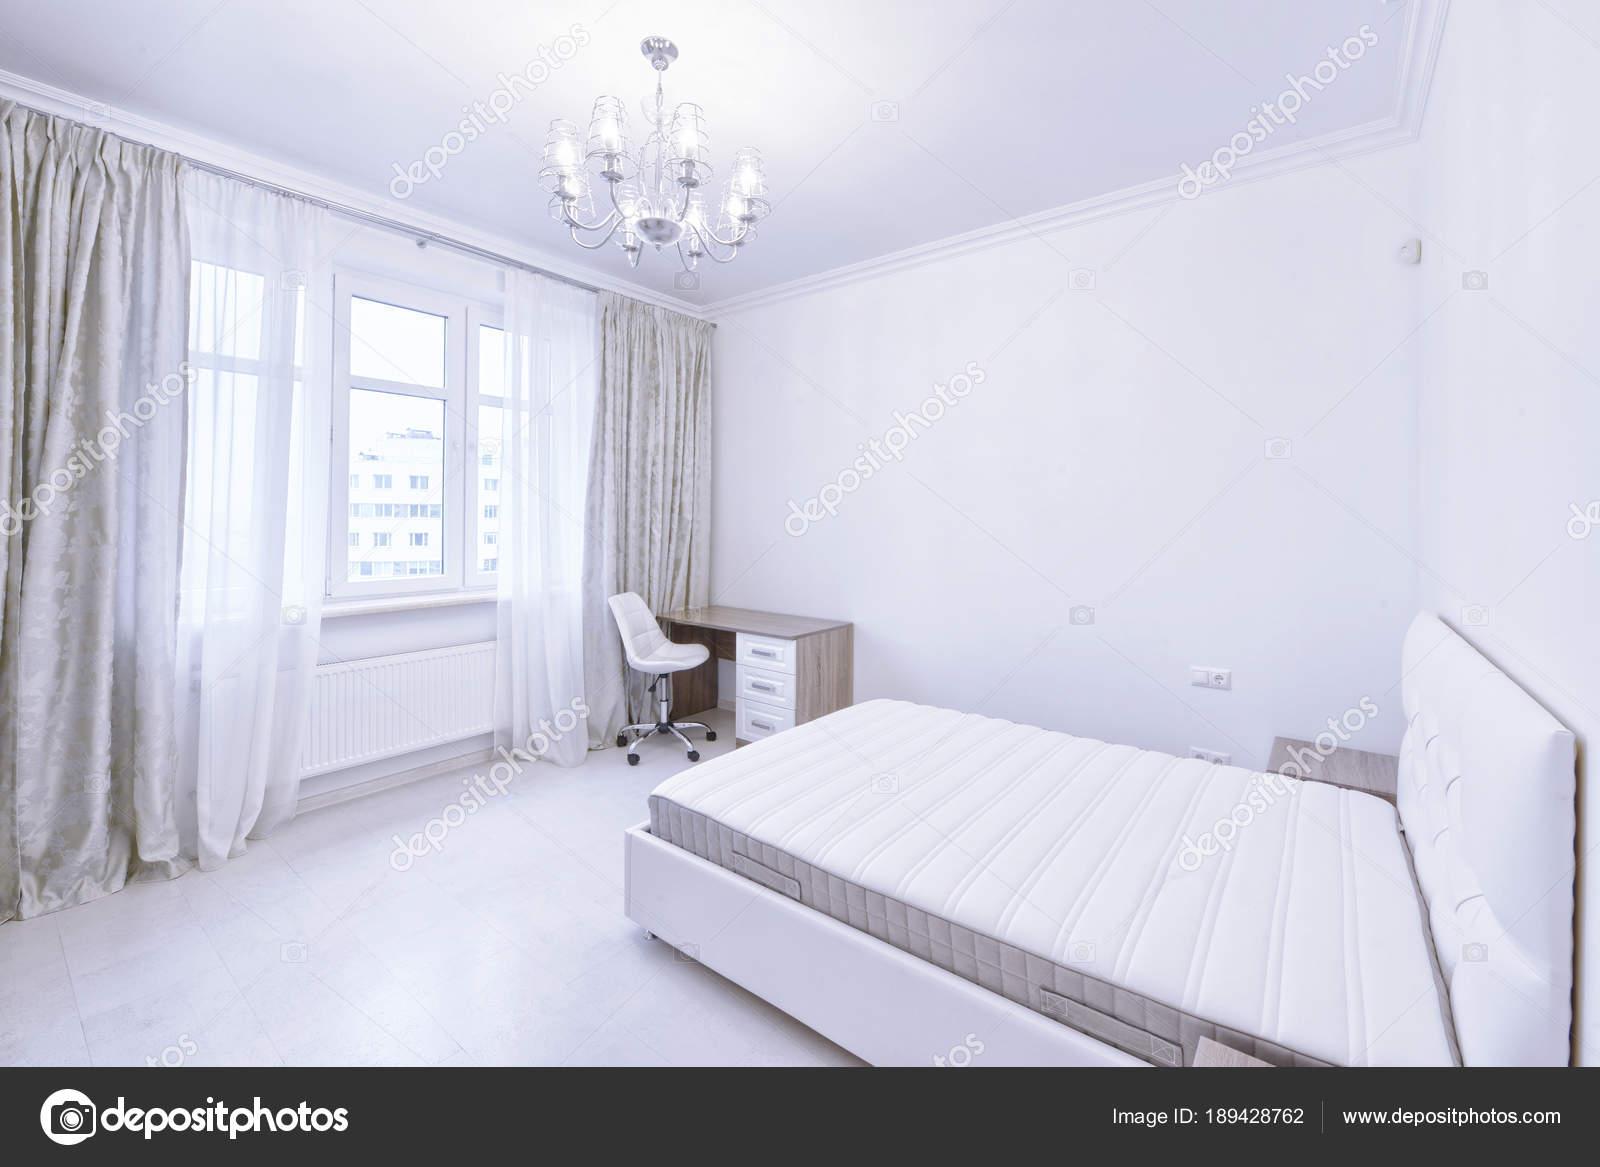 Slaapkamer Interieur Witte Kleur Modern Huis — Stockfoto ...